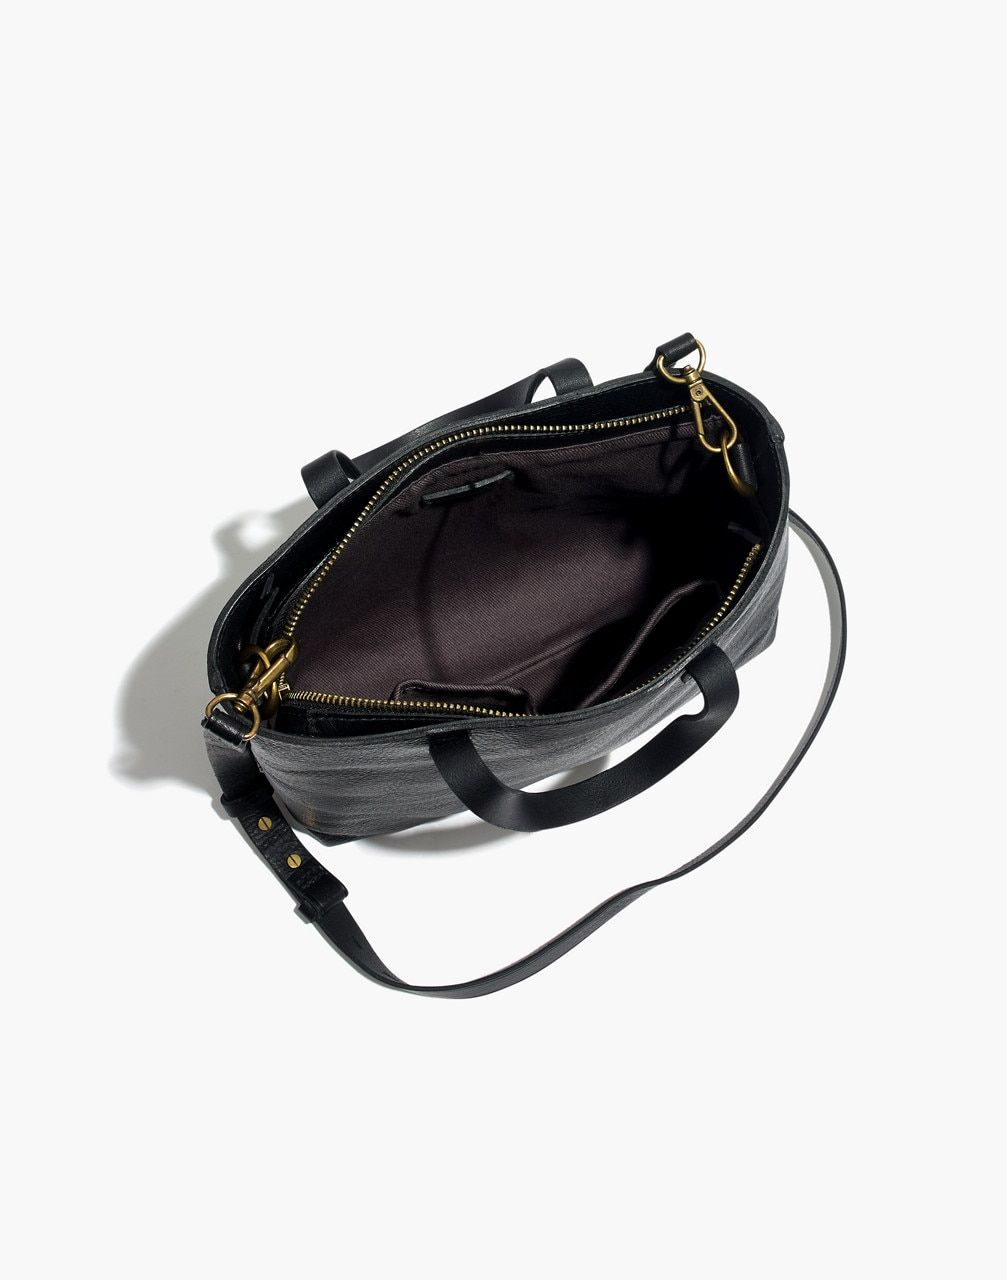 c53c7b91db  15 Violet Ray Leanna Triple Entry Tassel Crossbody Bag - Olive ...